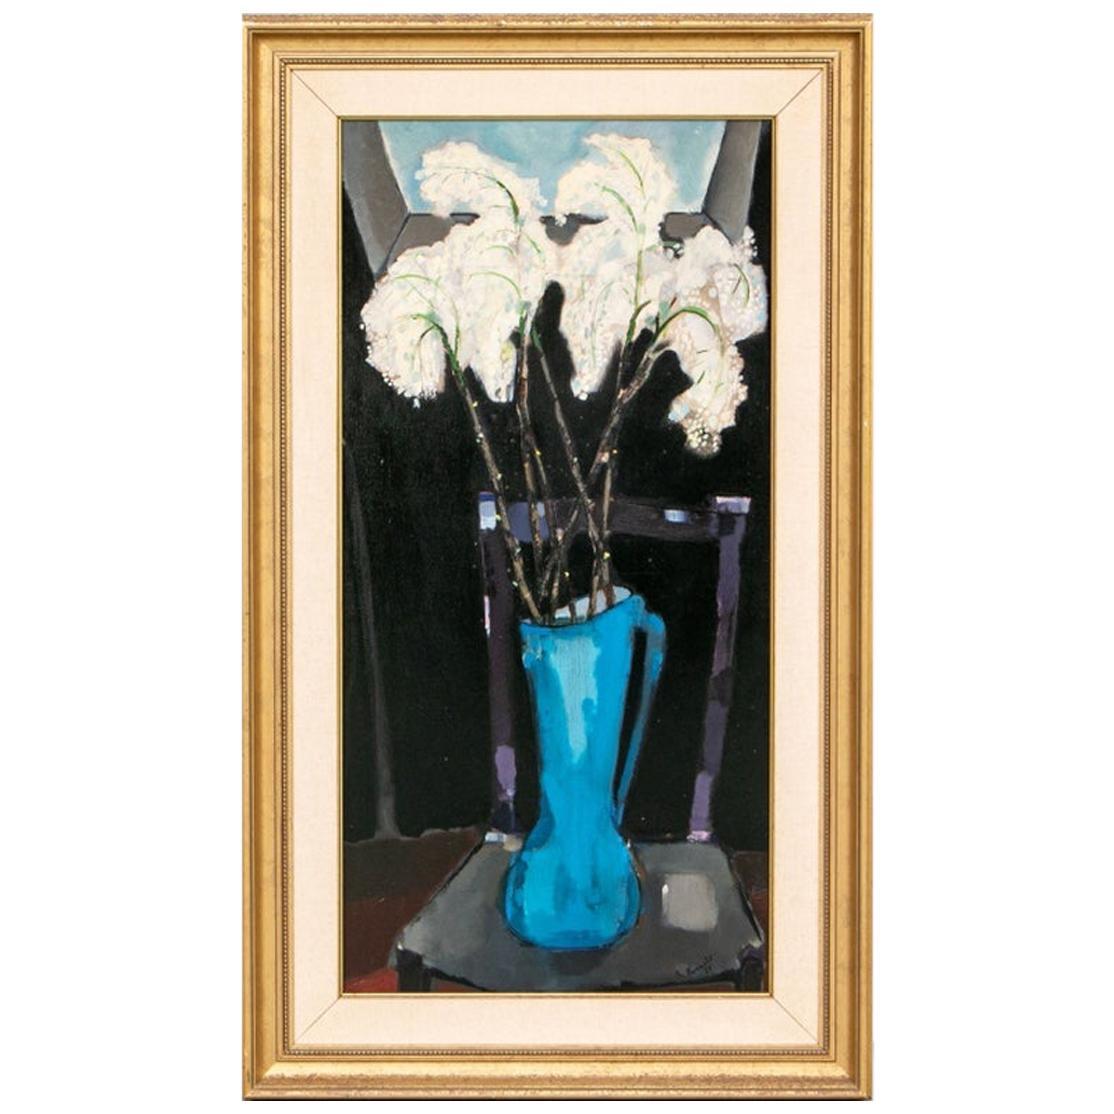 Renato Borsato 'Italian, 1927-2013' Midcentury Oil on Canvas of White Lillies